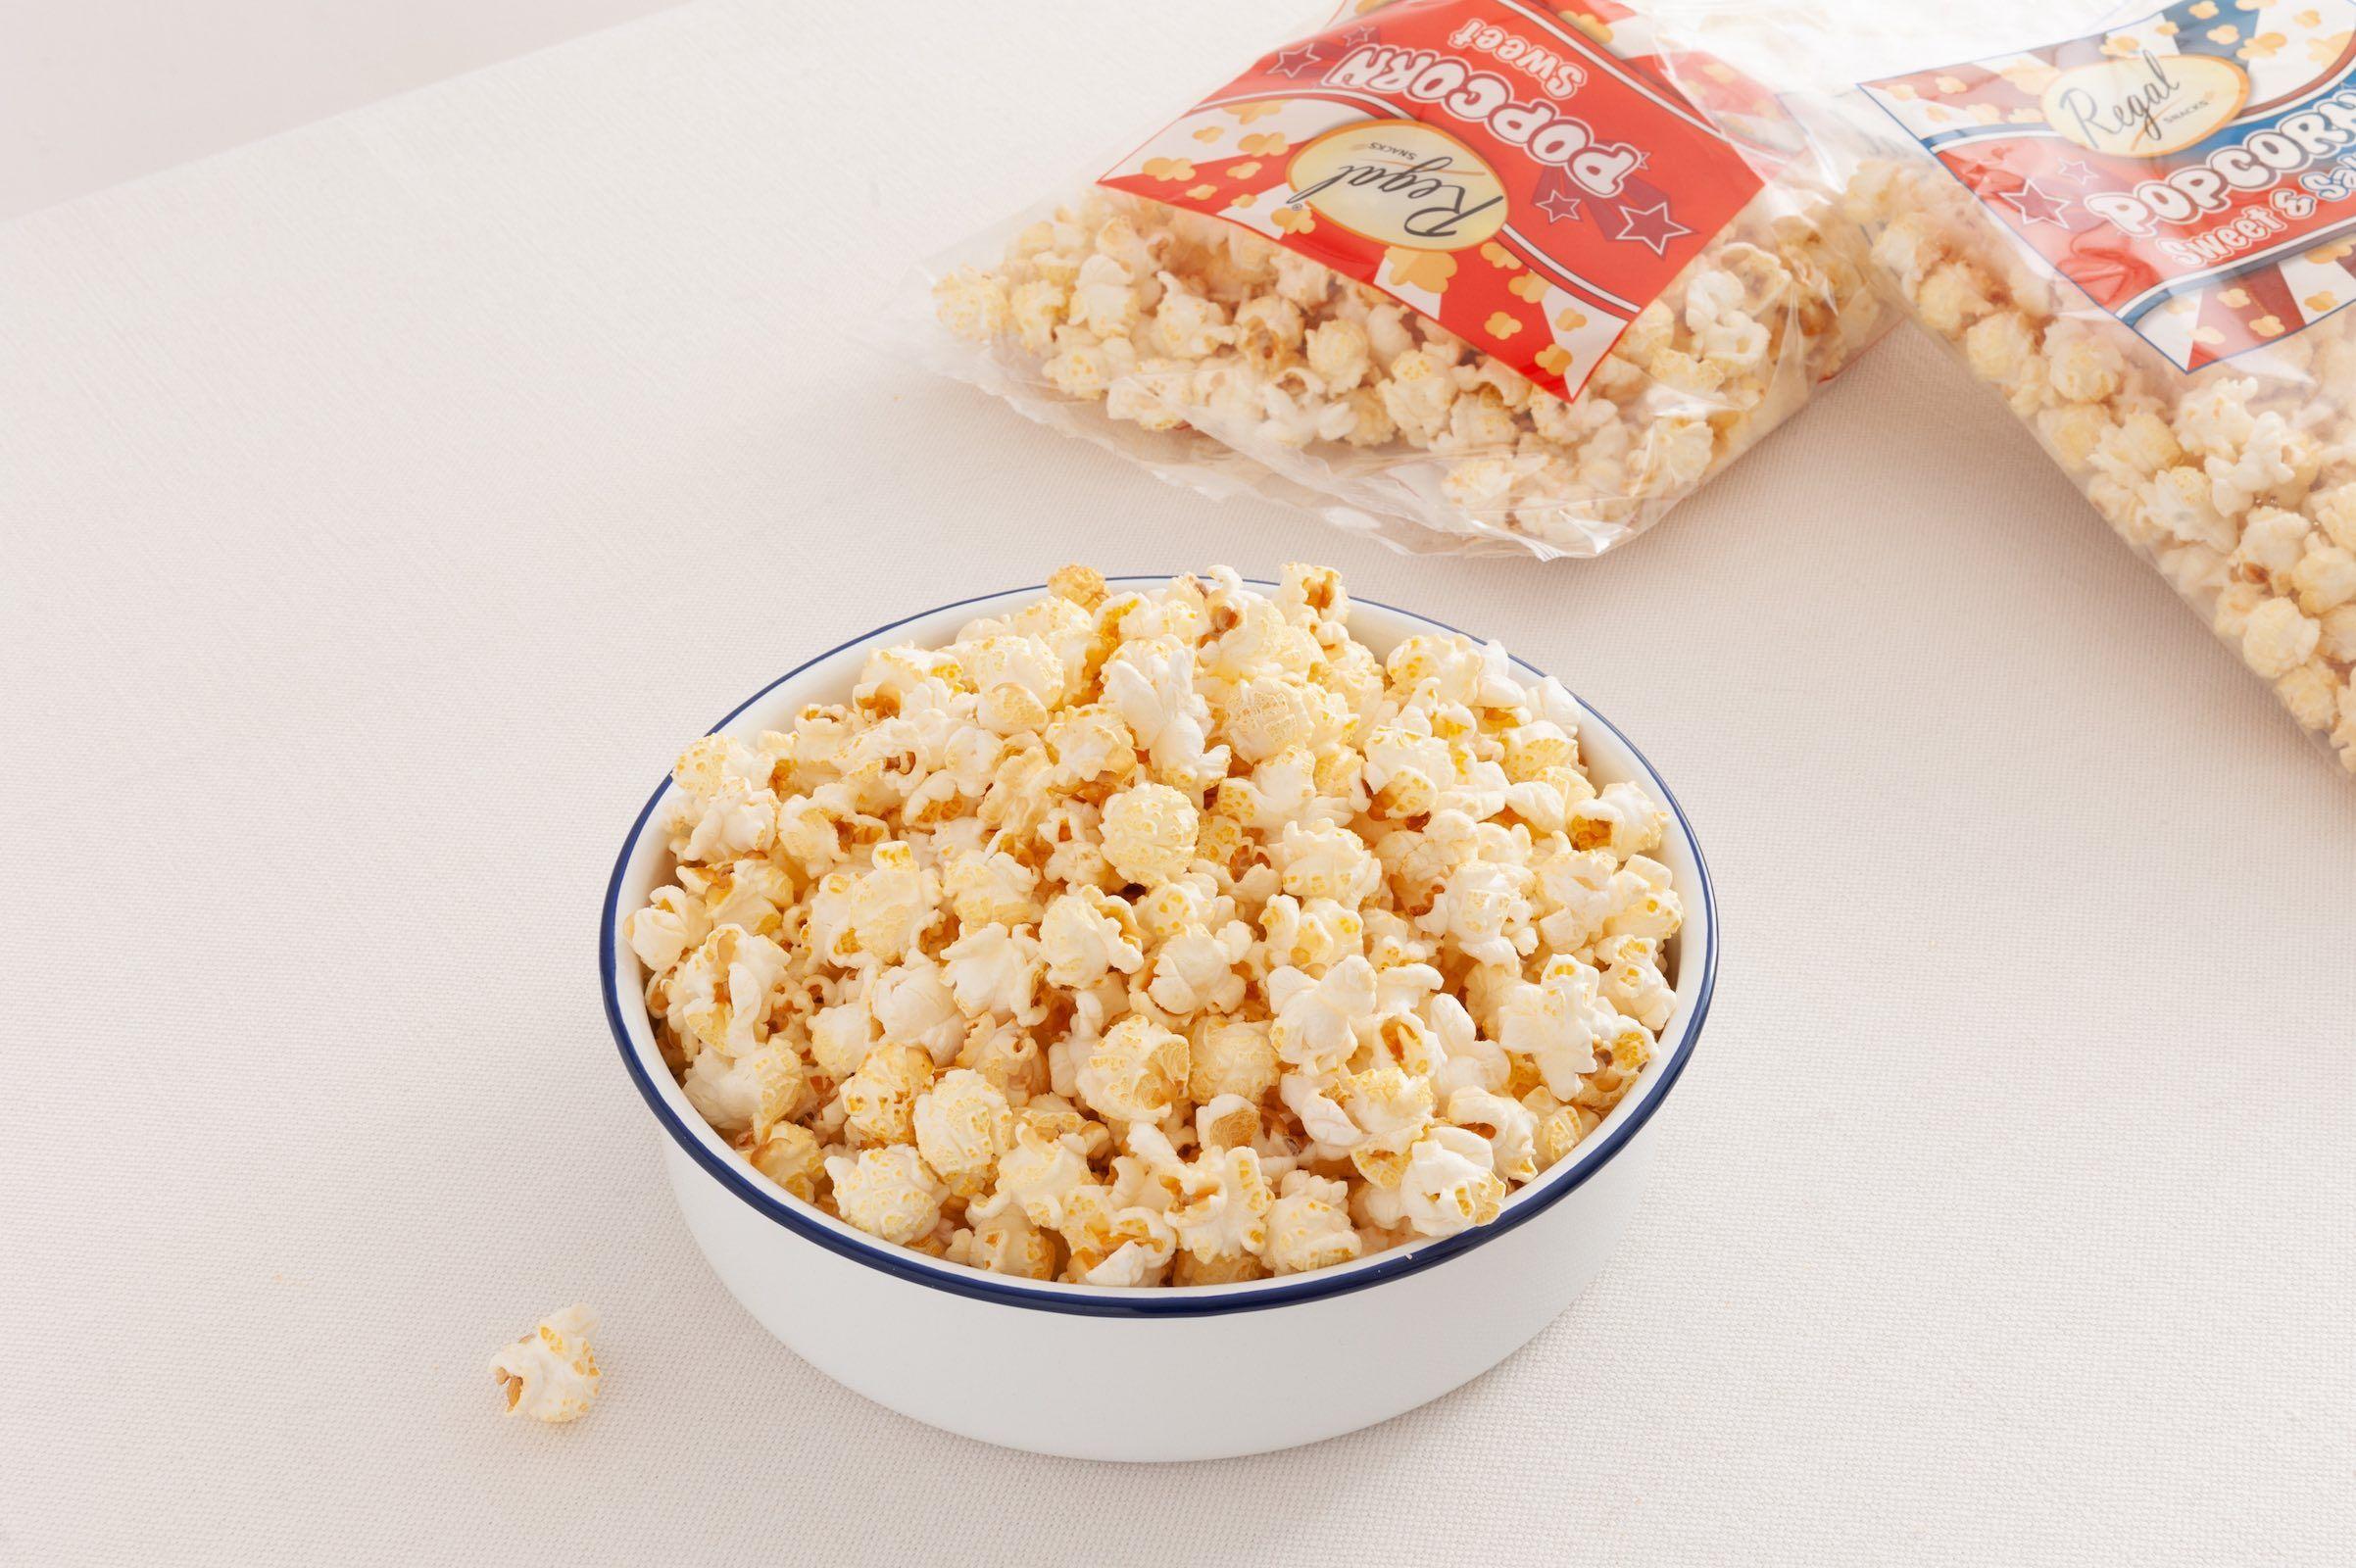 Popcorn recipes | Best salted popcorn recipes